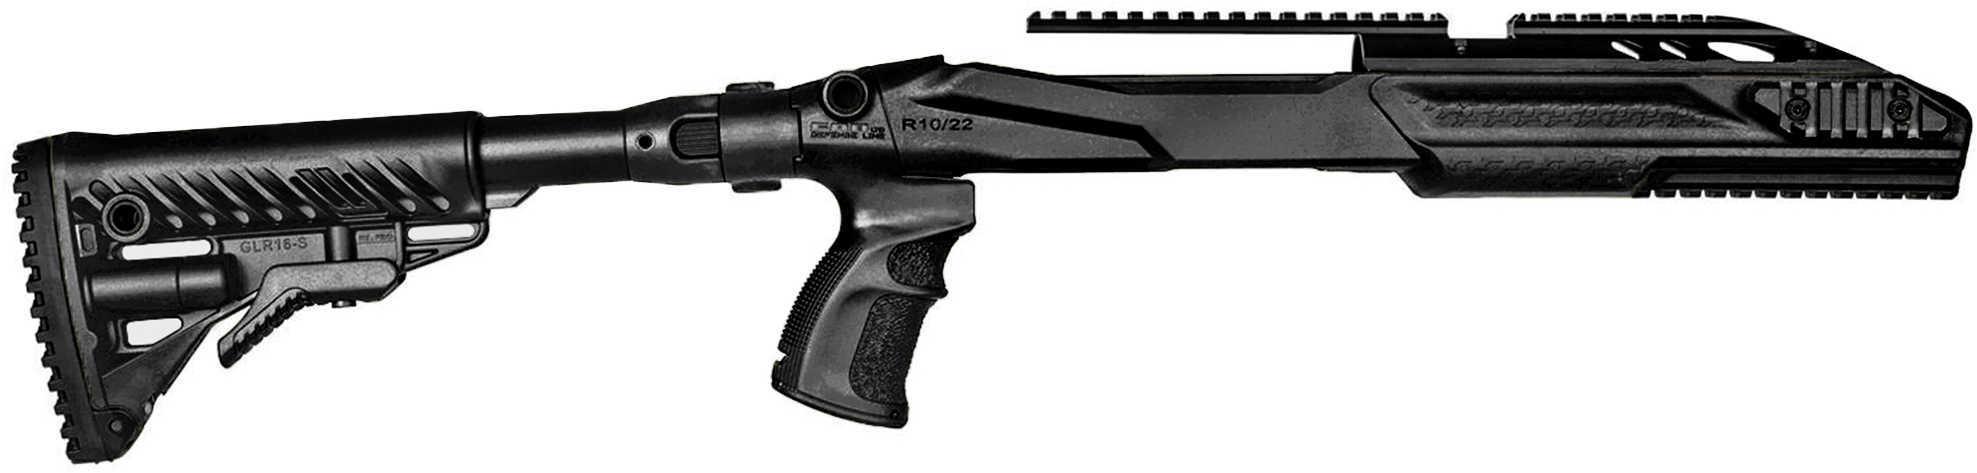 Mako Group Ruger® 10/22® M4 Precision Stock Pro Conversion Kit Black